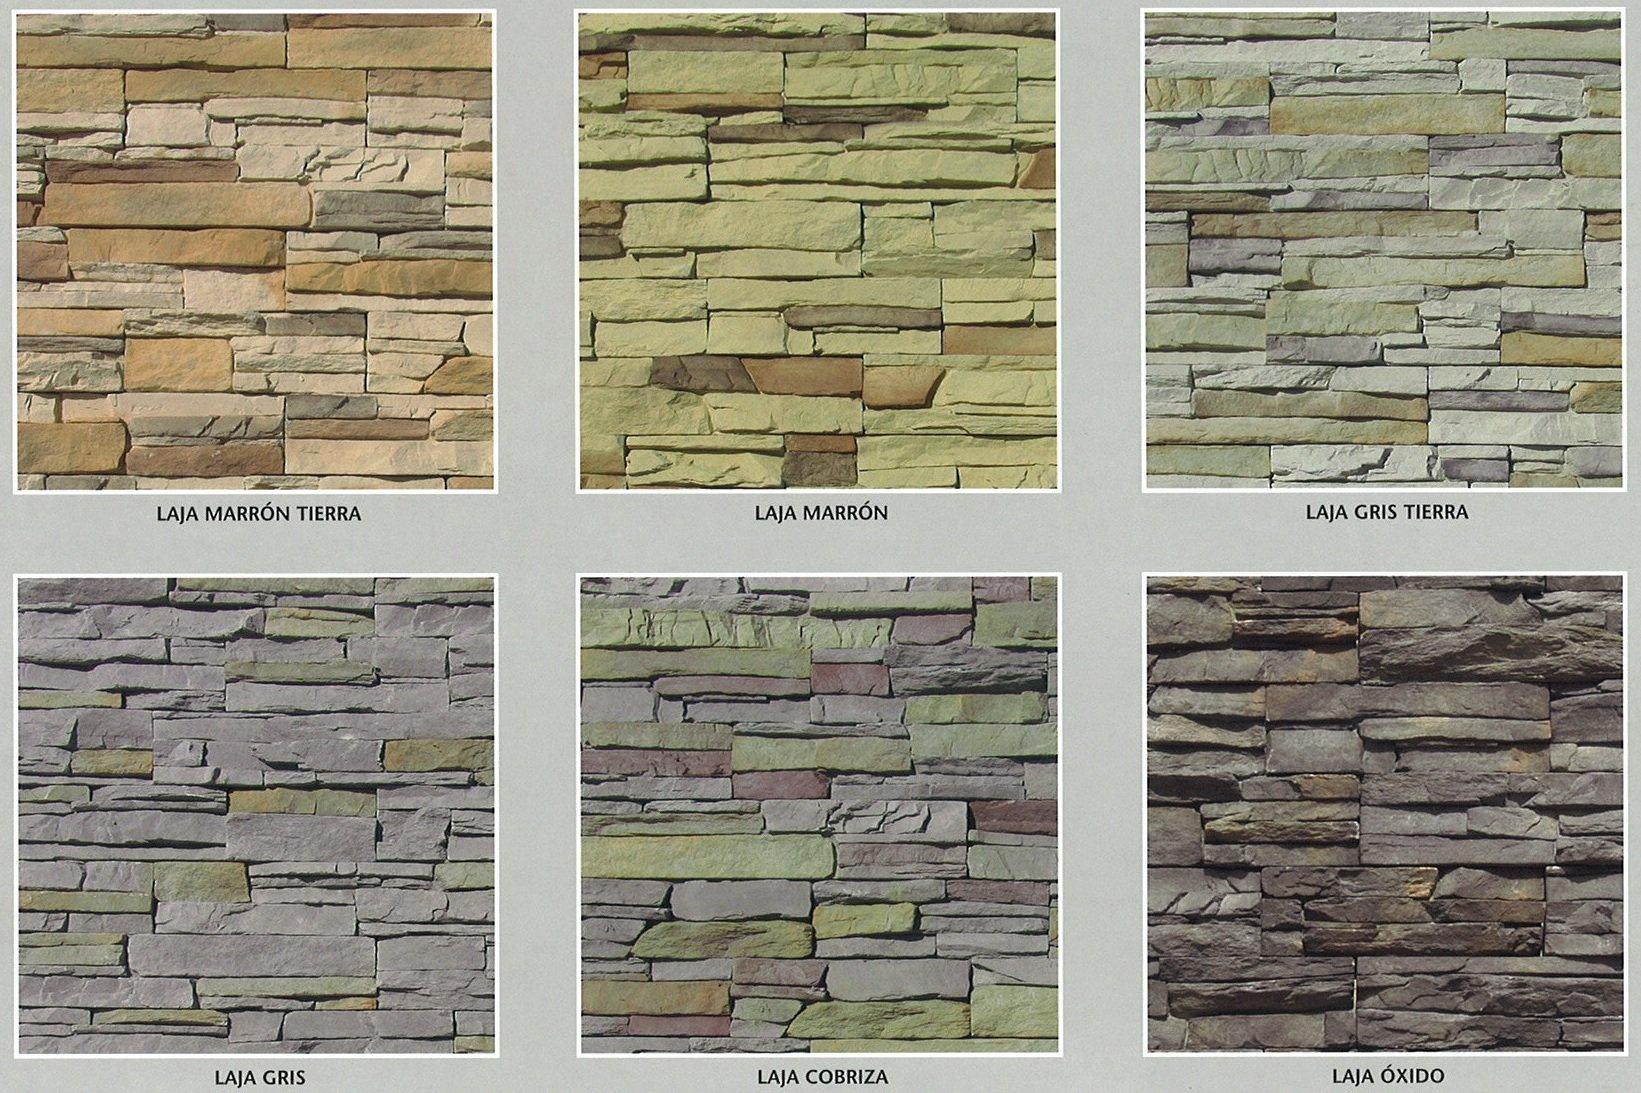 Piedra cultivada modelo monte panel cemat gijon asturias - Piedra caliza para fachadas ...